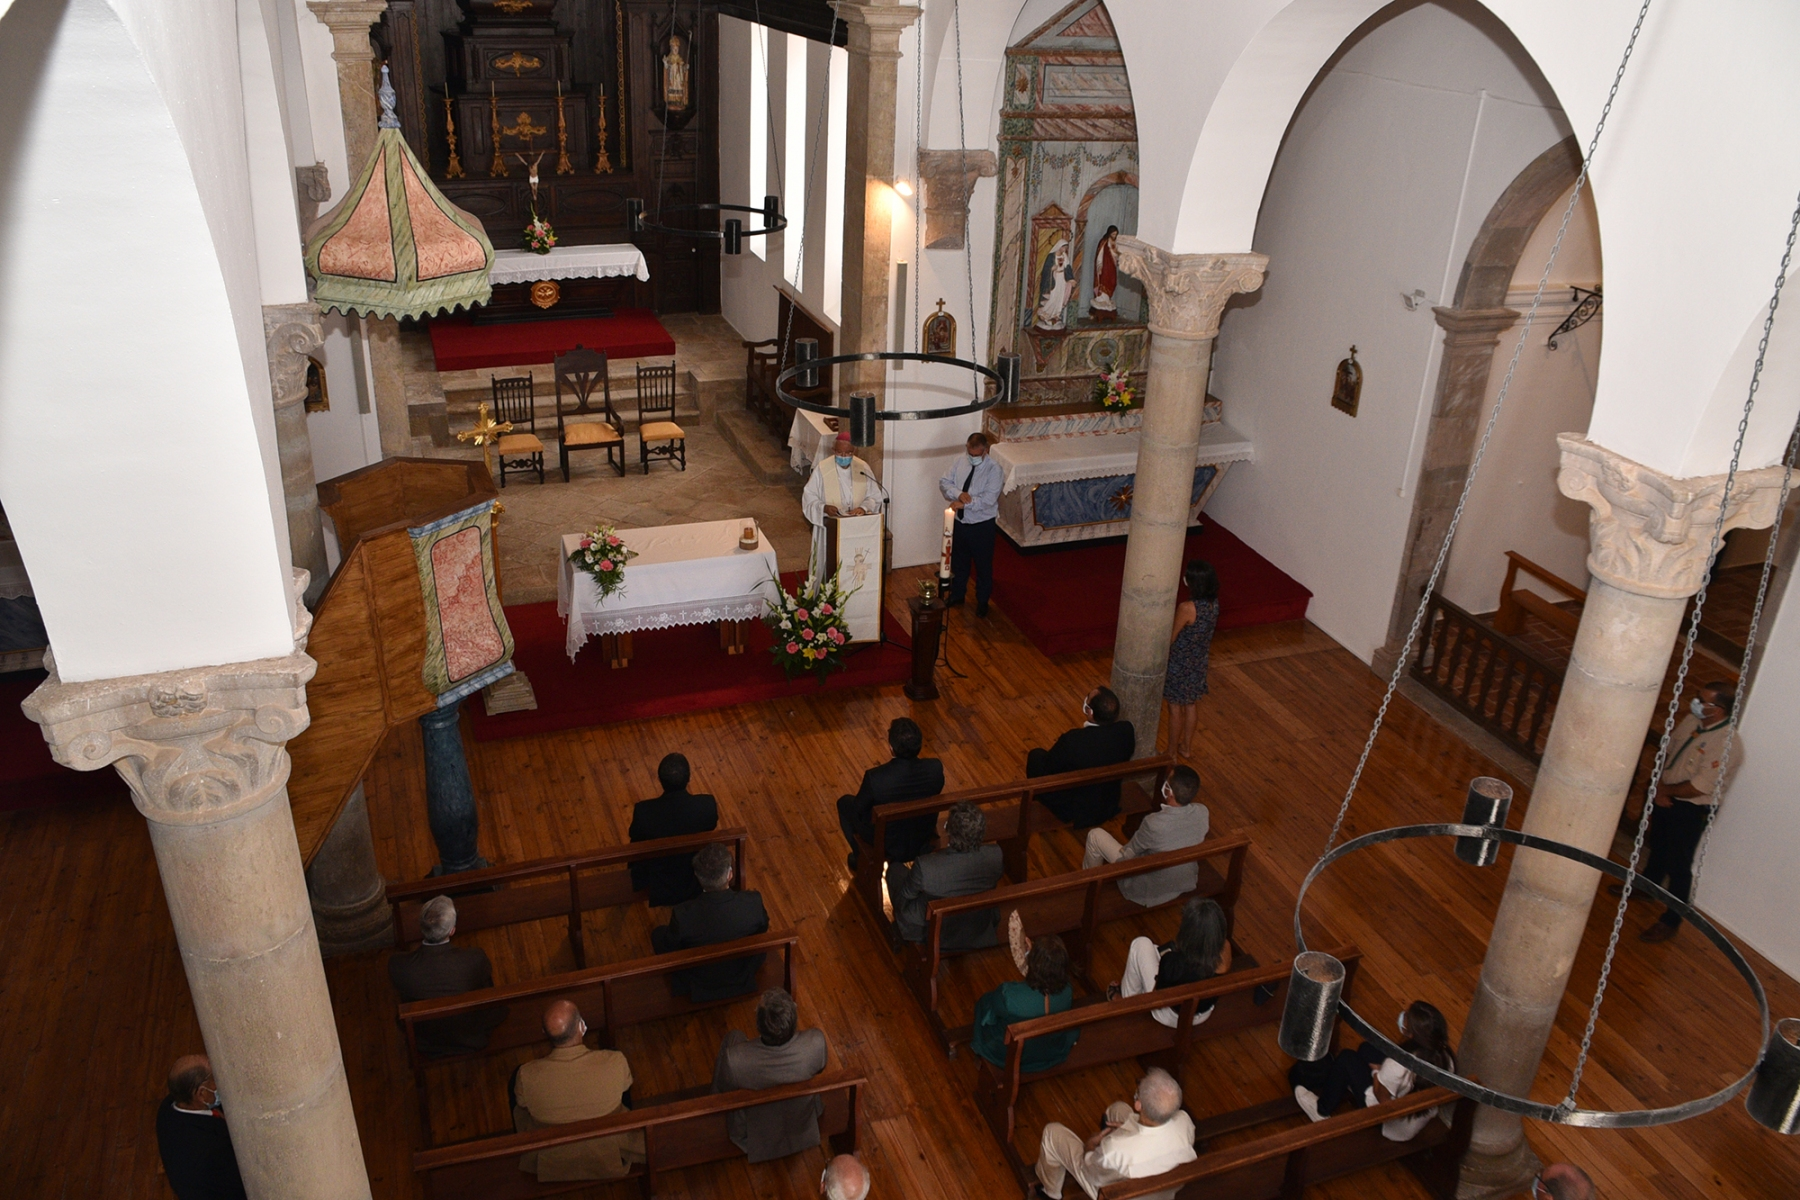 Inauguracao_bencao_obras_restauro_igreja_alcoutim-29